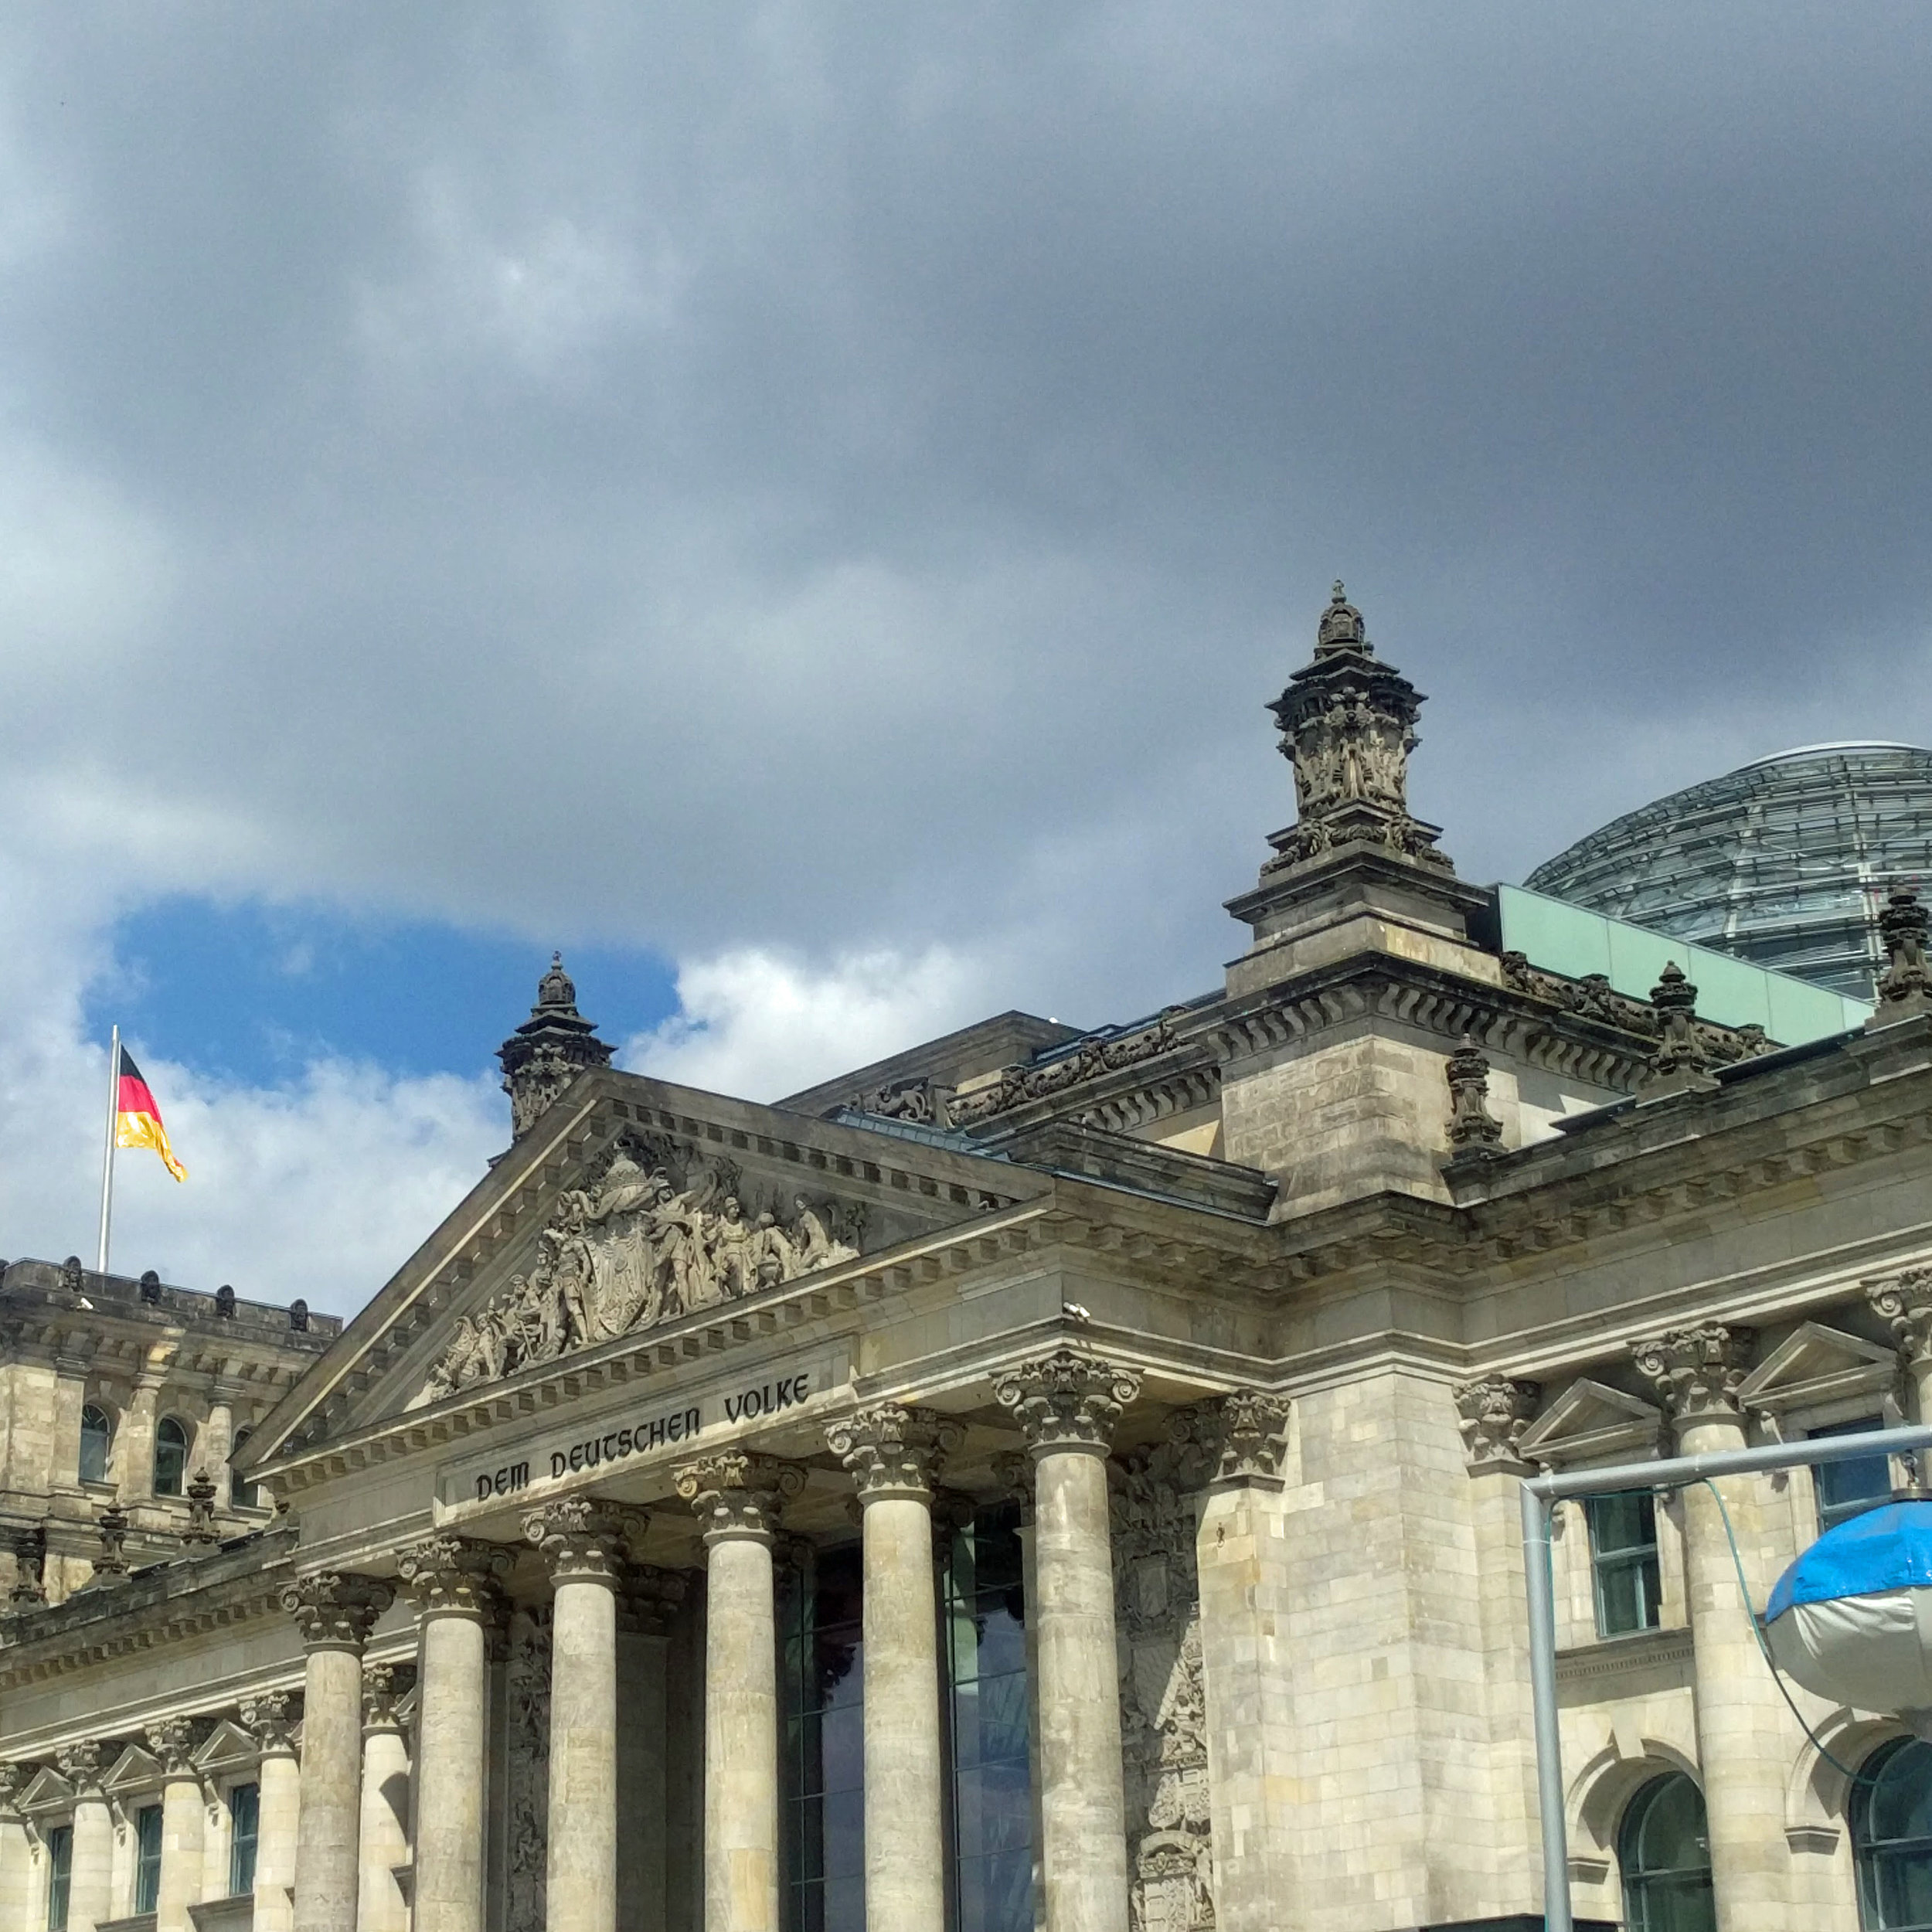 Reichstag Building in Berlin Germany. One year in Berlin. Jamie House Design. First year in Berlin.